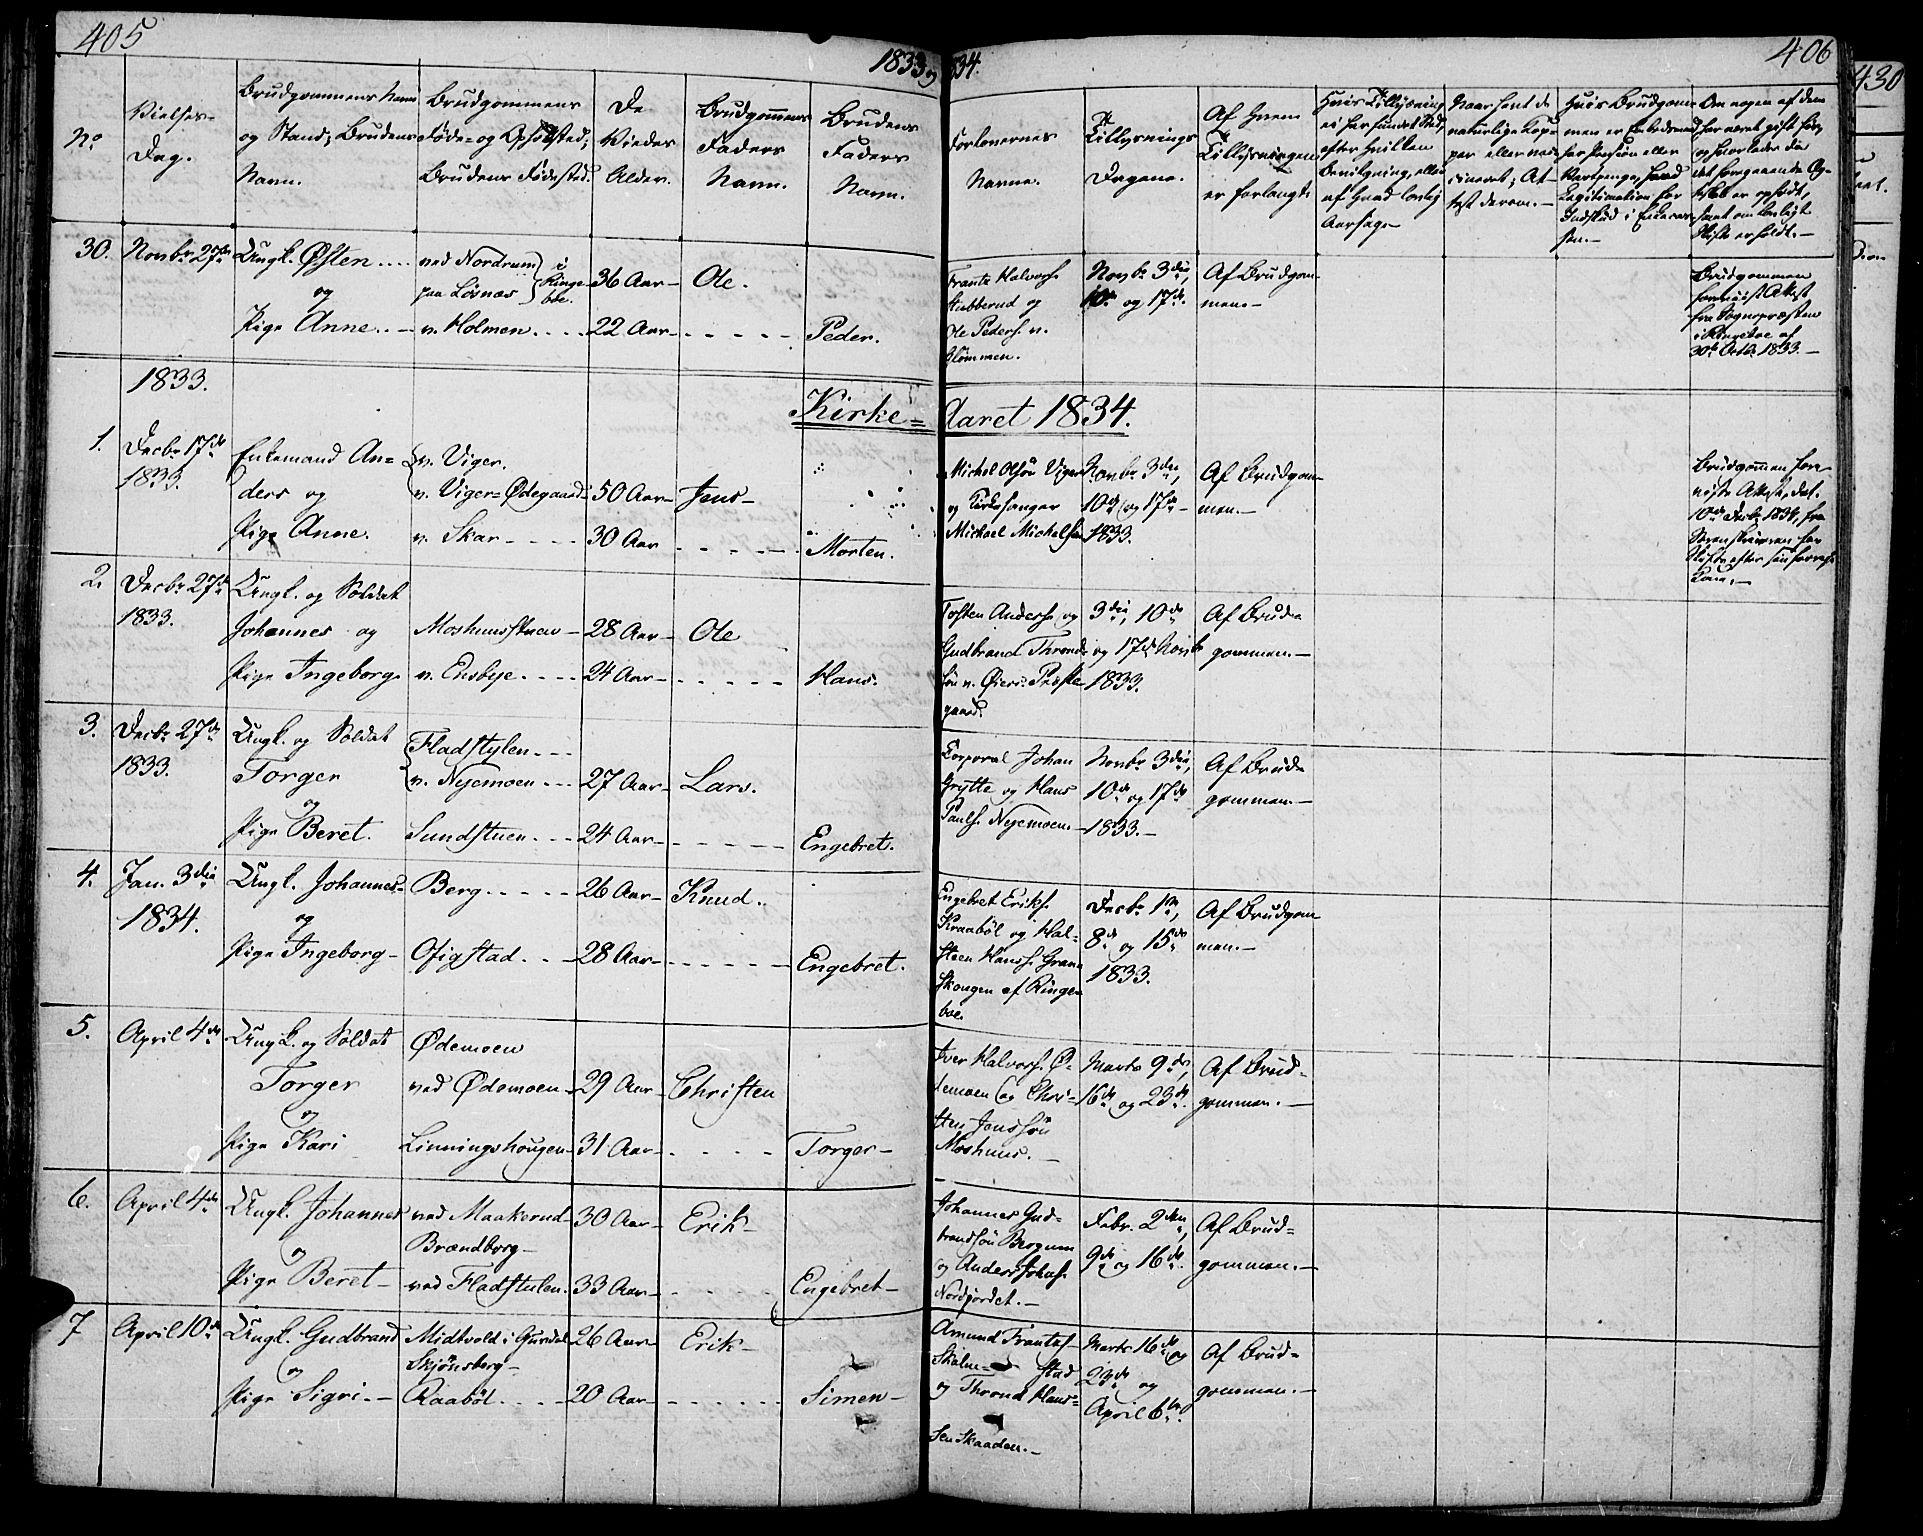 SAH, Øyer prestekontor, Ministerialbok nr. 4, 1824-1841, s. 405-406